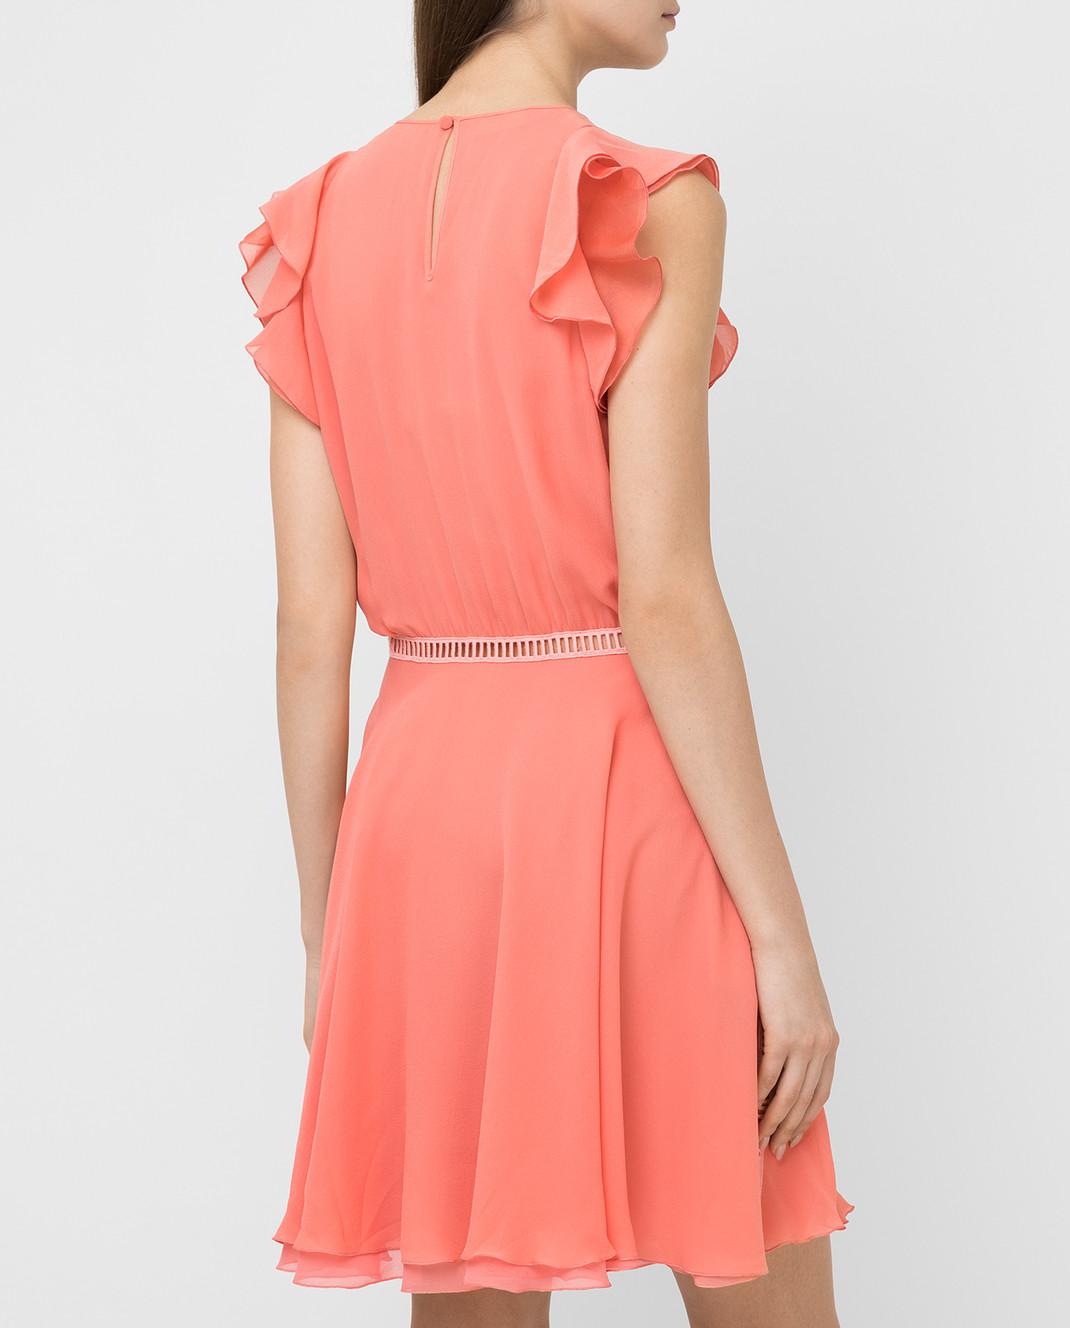 Giamba Коралловое платье из шелка PG5250 изображение 4